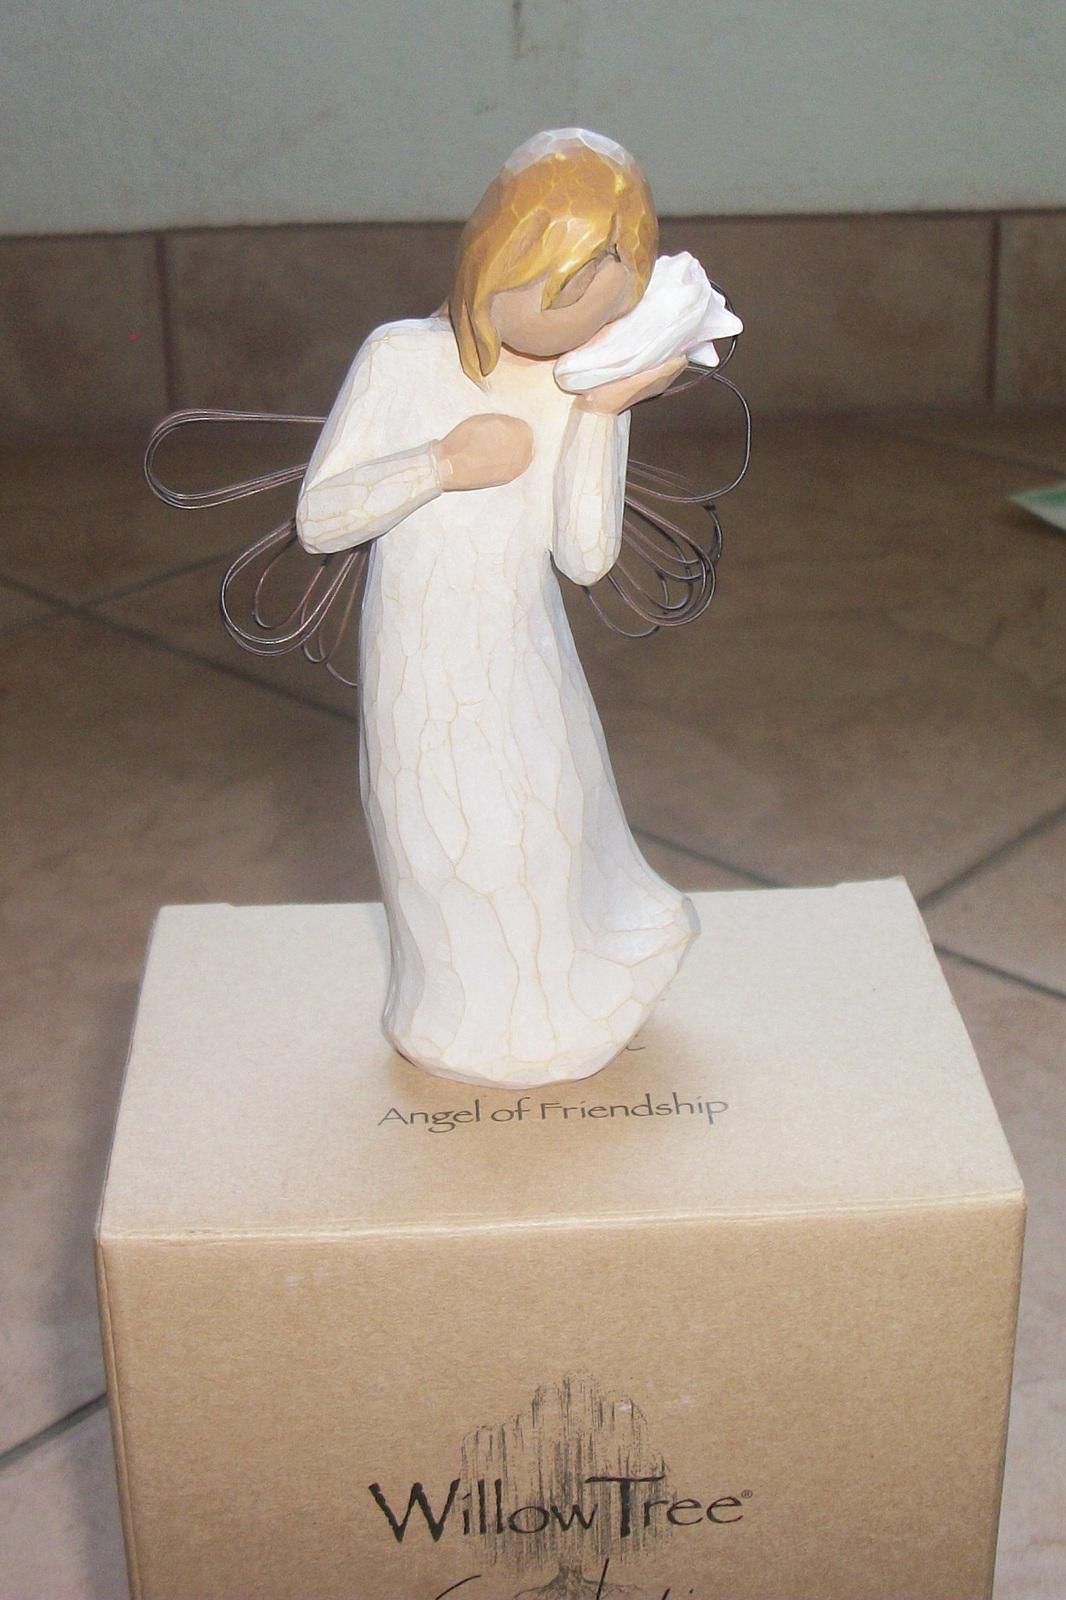 angel knick knack willow tree susan lordi angel of friendship new